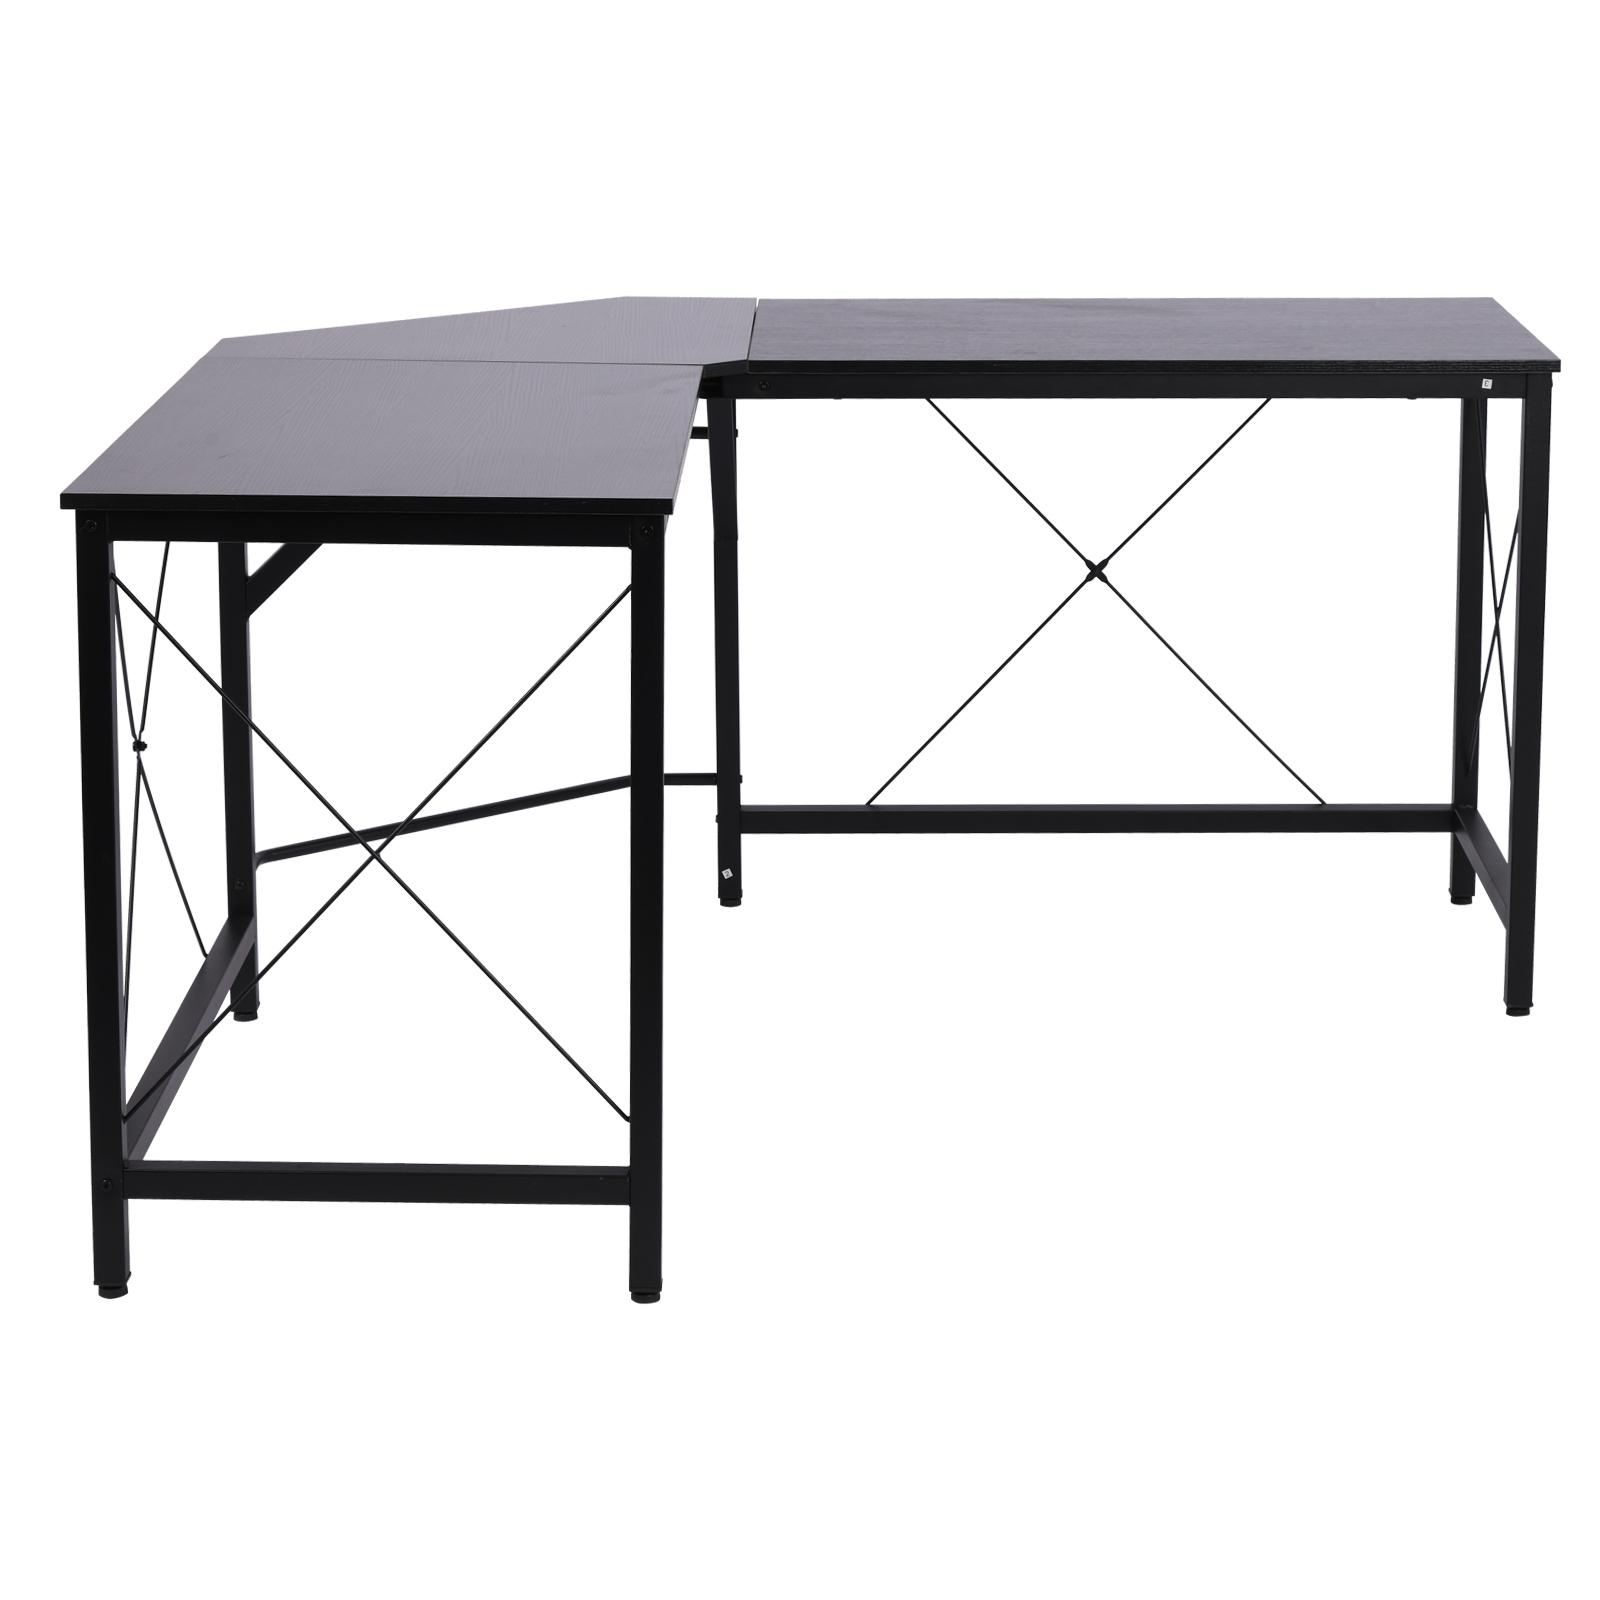 L-Shaped-Computer-Desk-Office-Wood-Corner-PC-Workstation-Large-Gaming-Desk-Table miniature 8